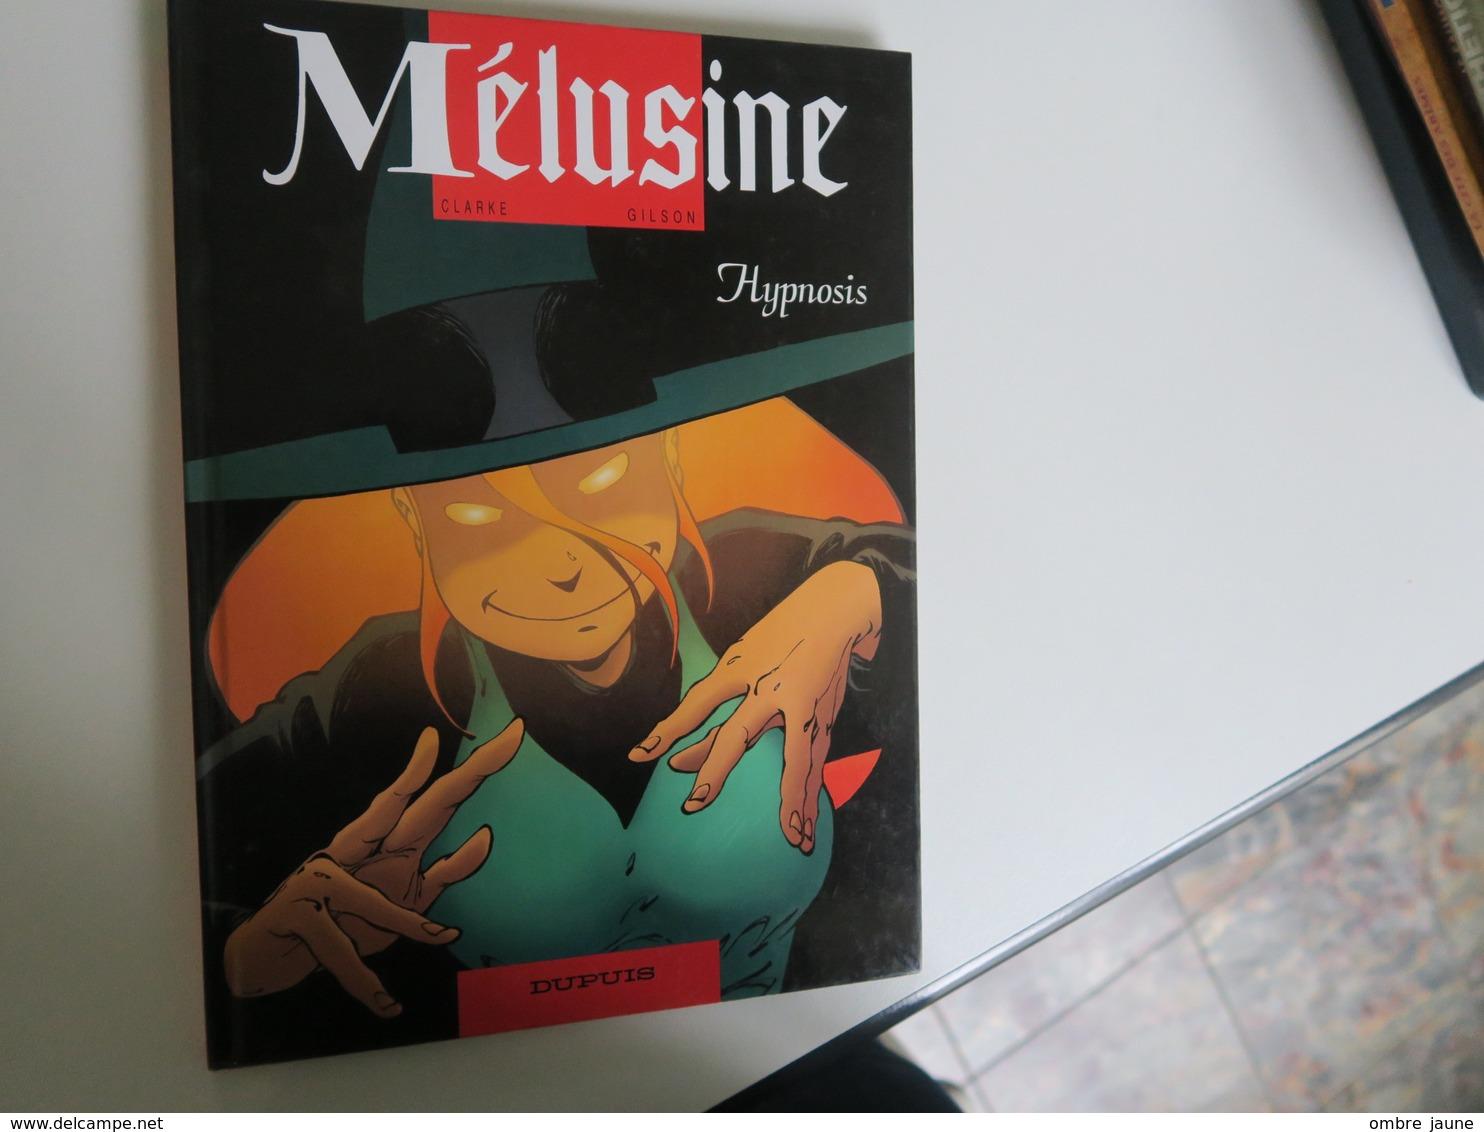 BD -  MELUSINE - EO Du N° 9 - HYPNOSIS - CLARKE / GILSON - Mélusine